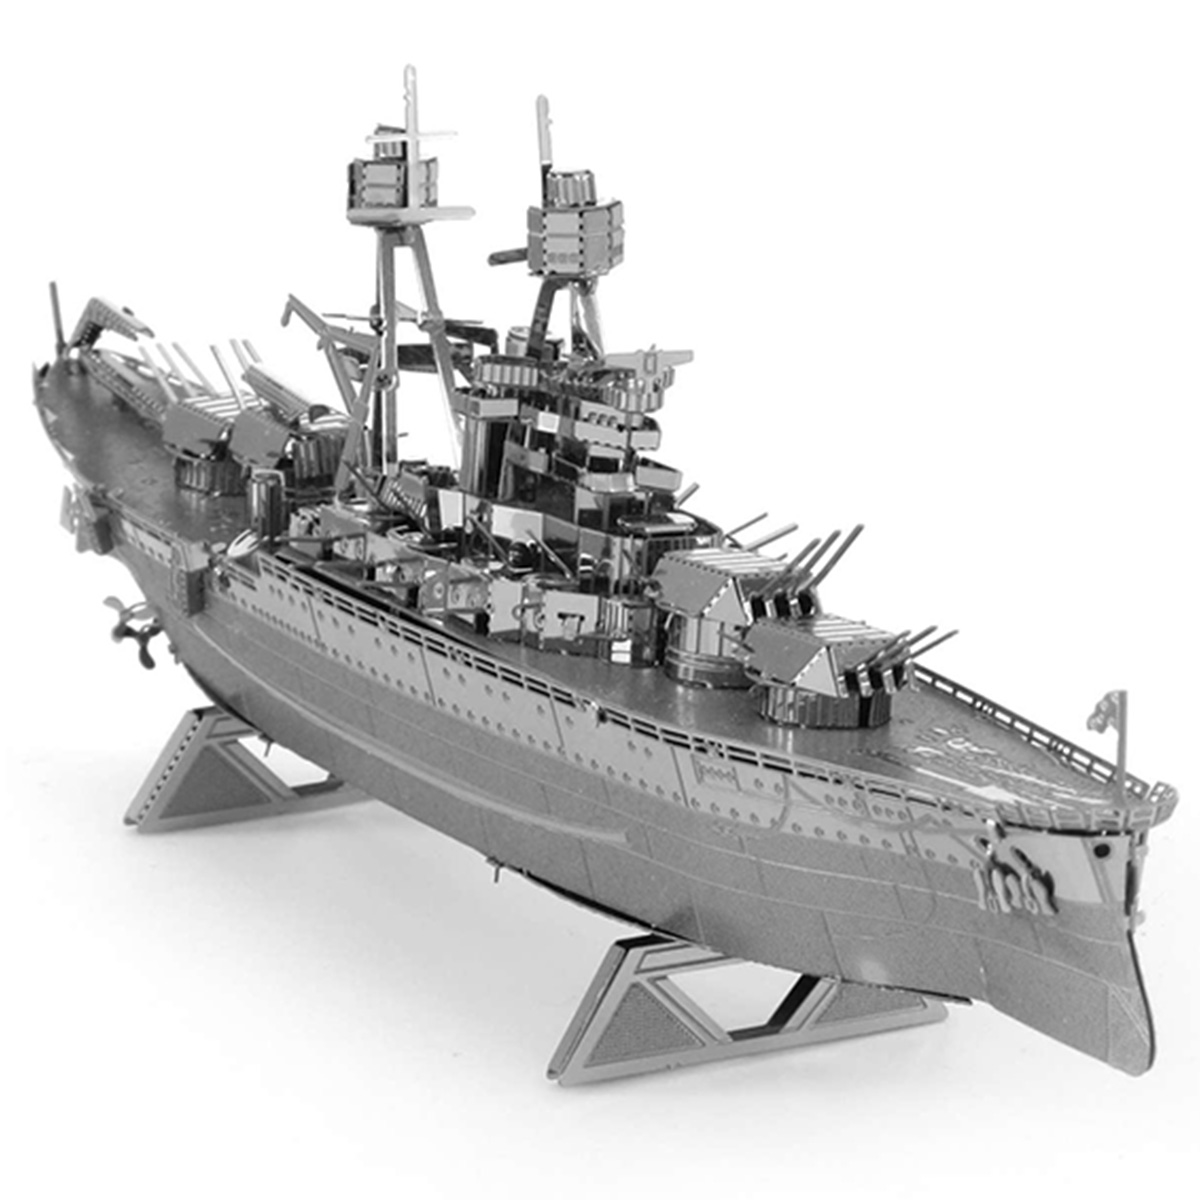 Uss Arizona 3d Metal Model Ships Kits Innovatoys Metal